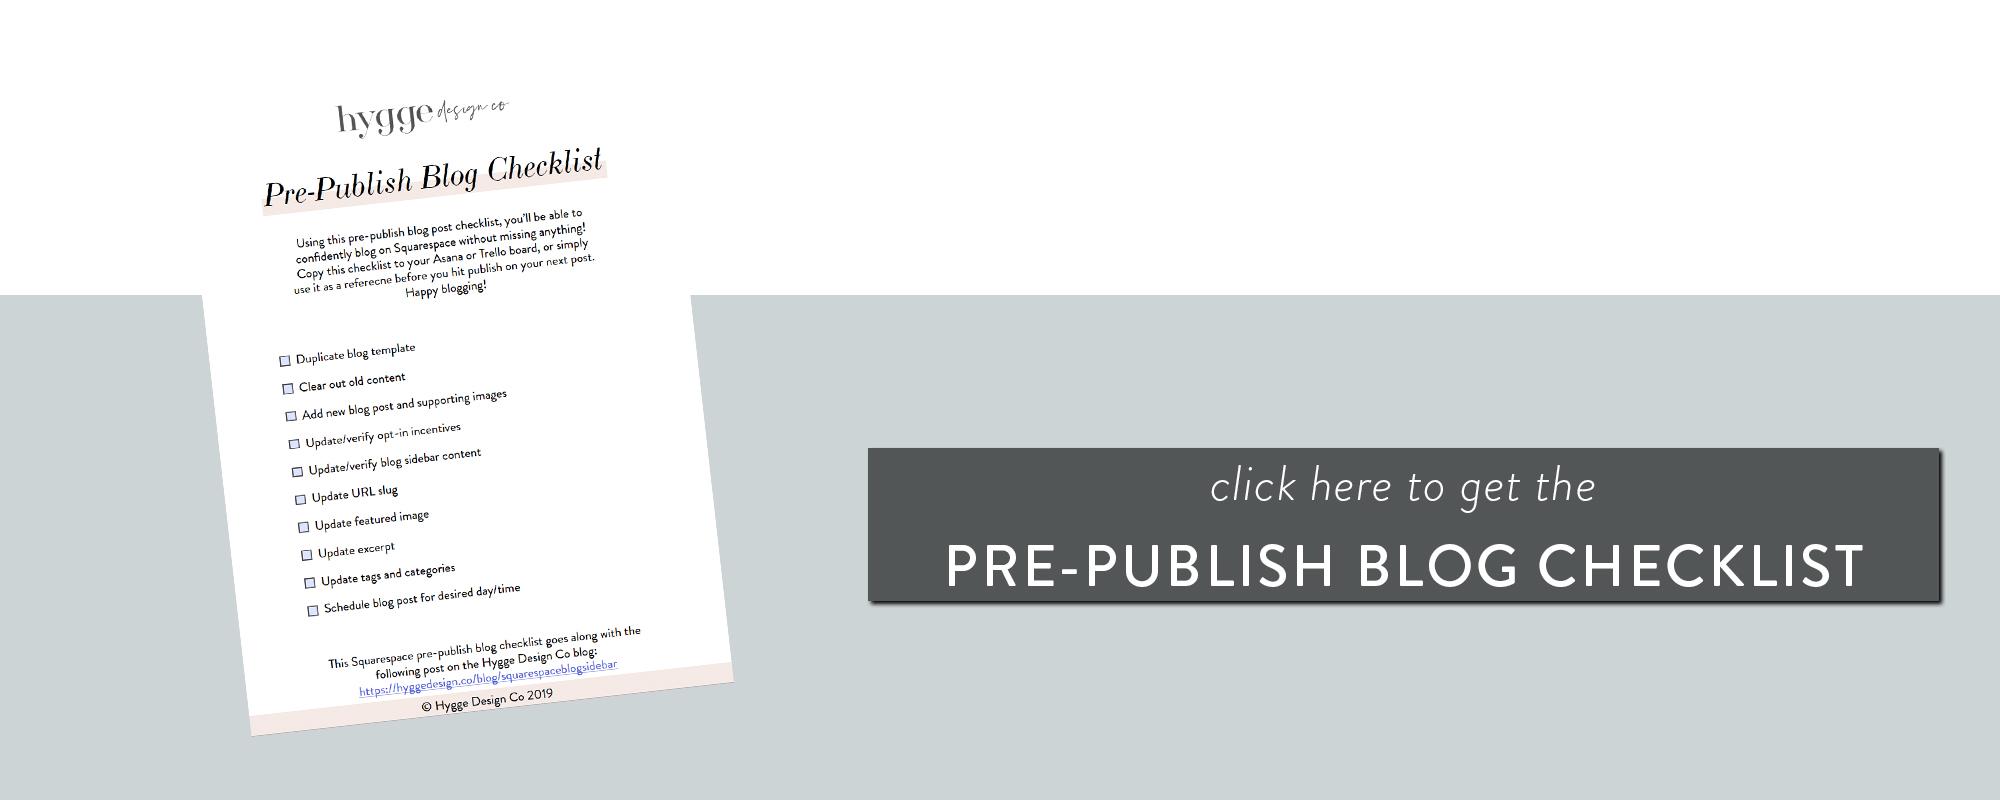 PRE publish blog checklist ad.jpg